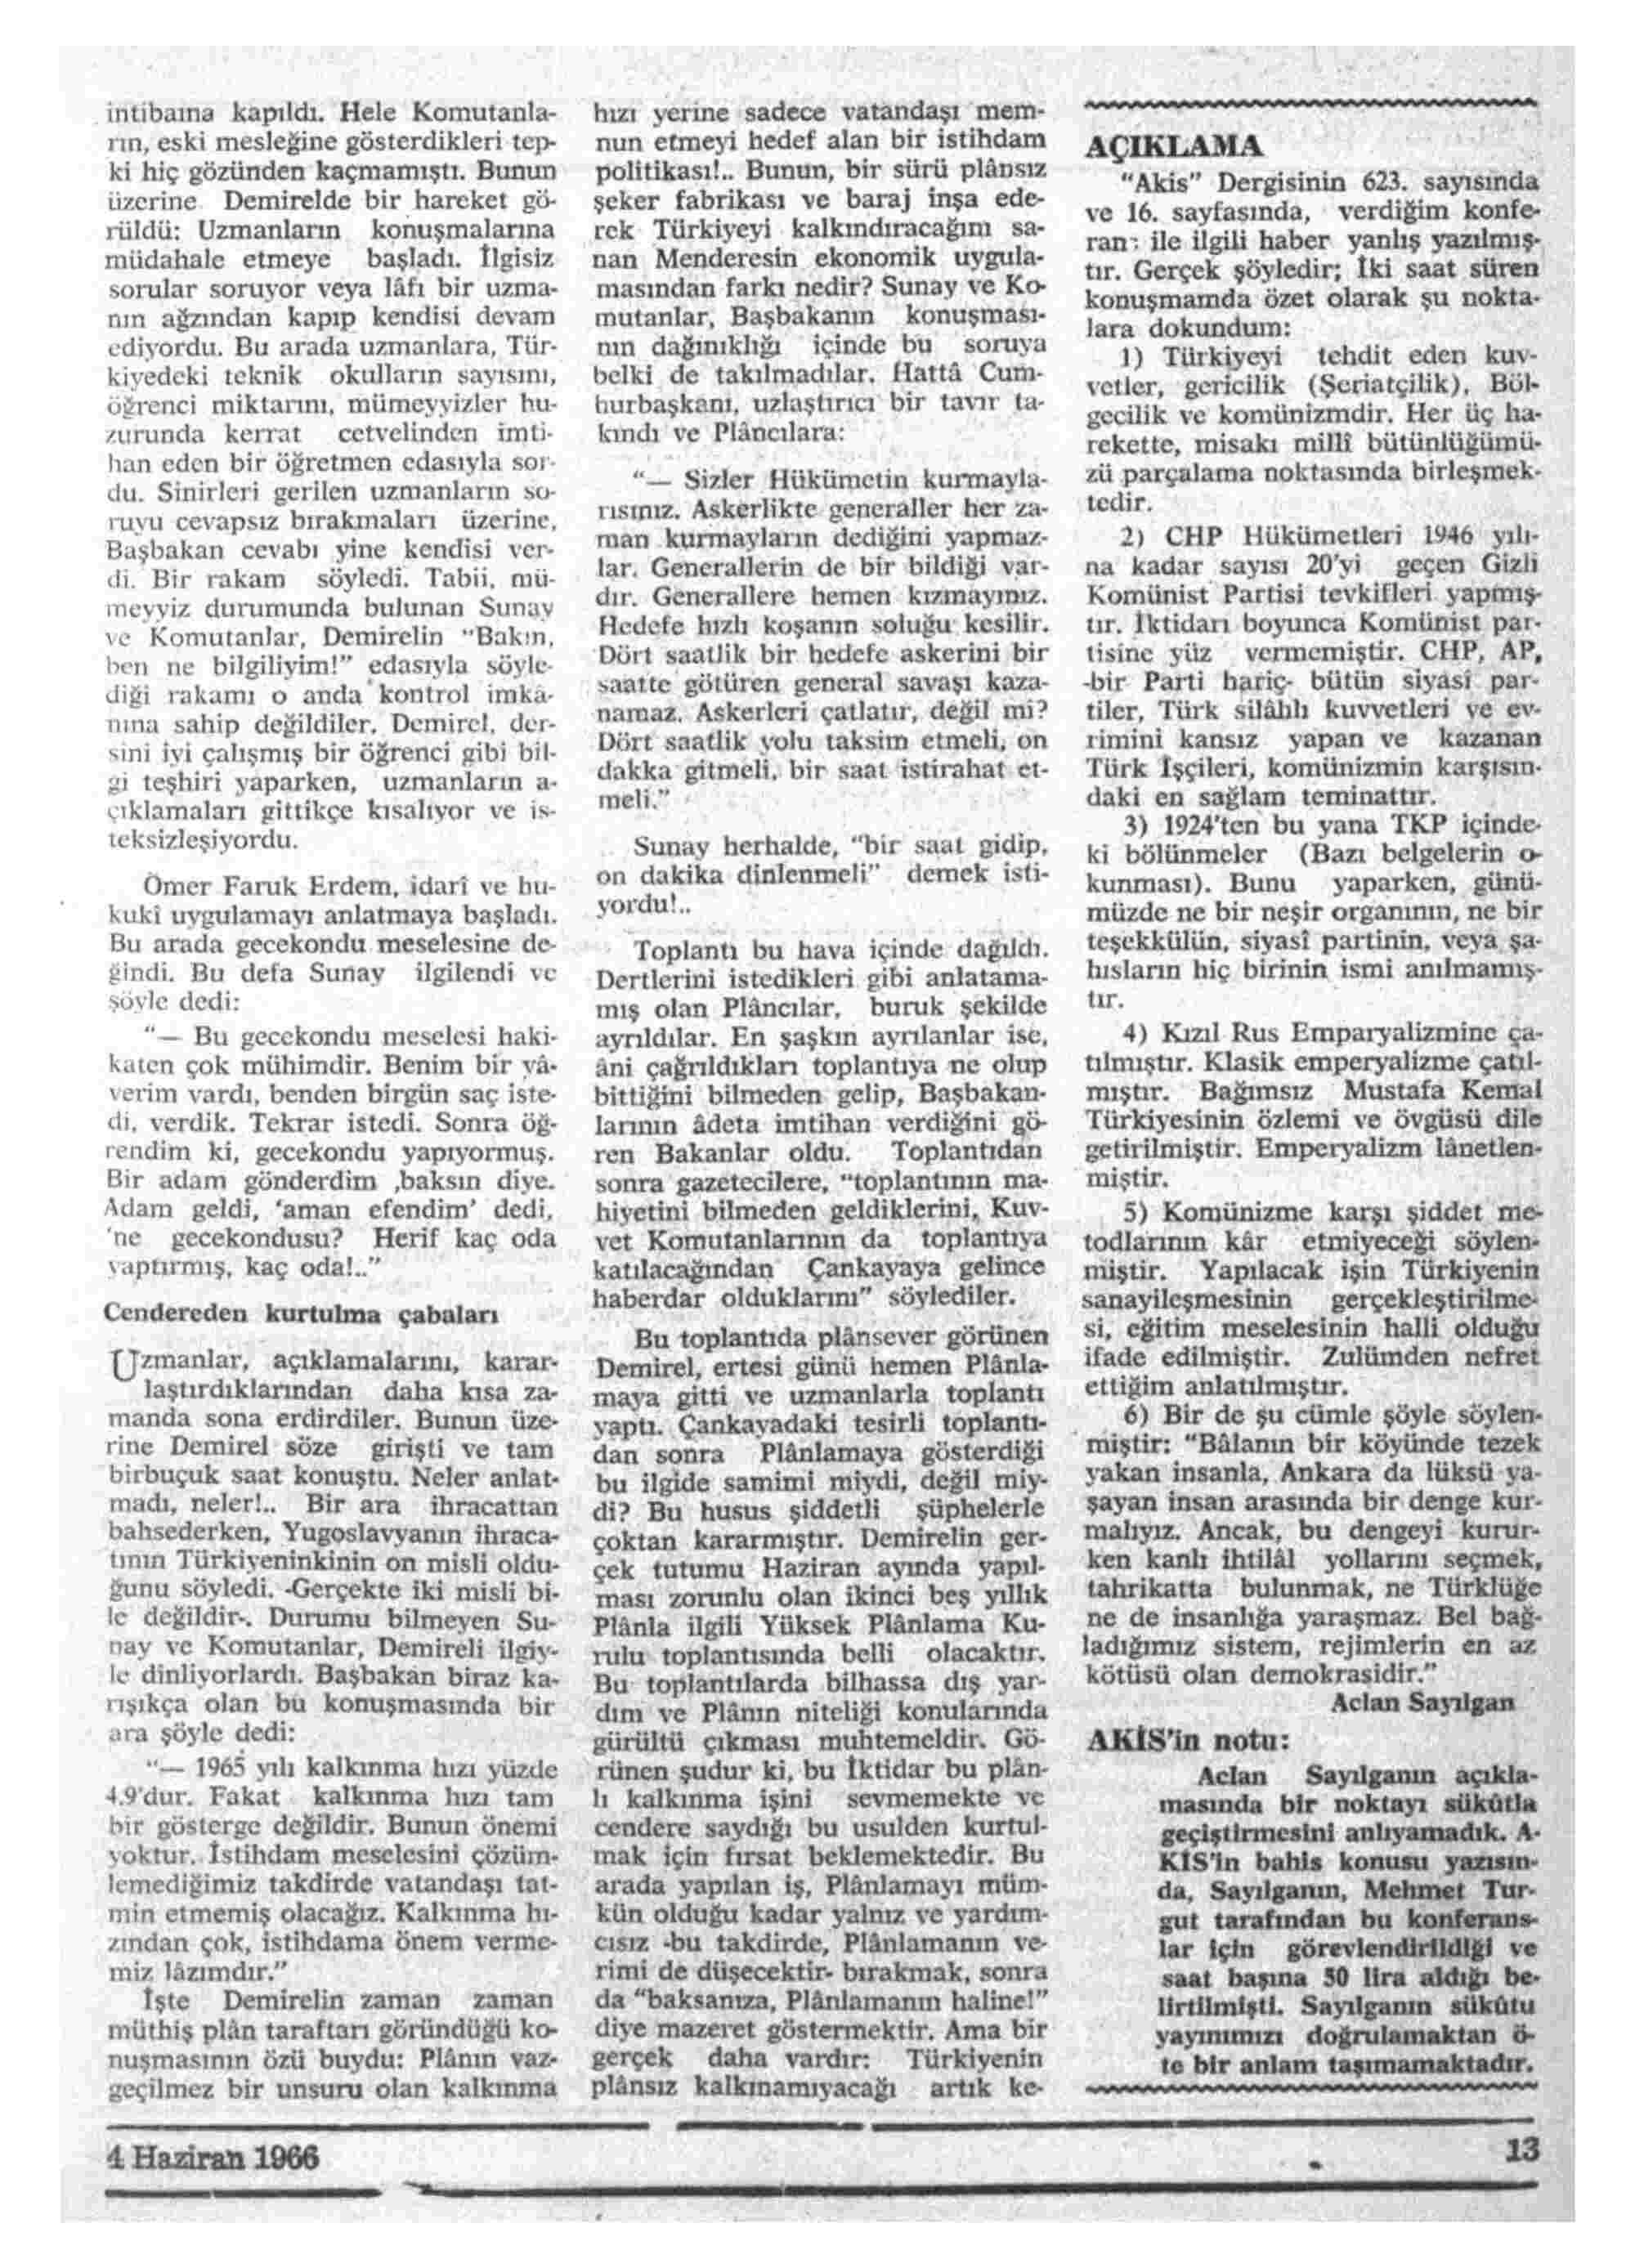 4 Haziran 1966 Tarihli Akis Dergisi Sayfa 13